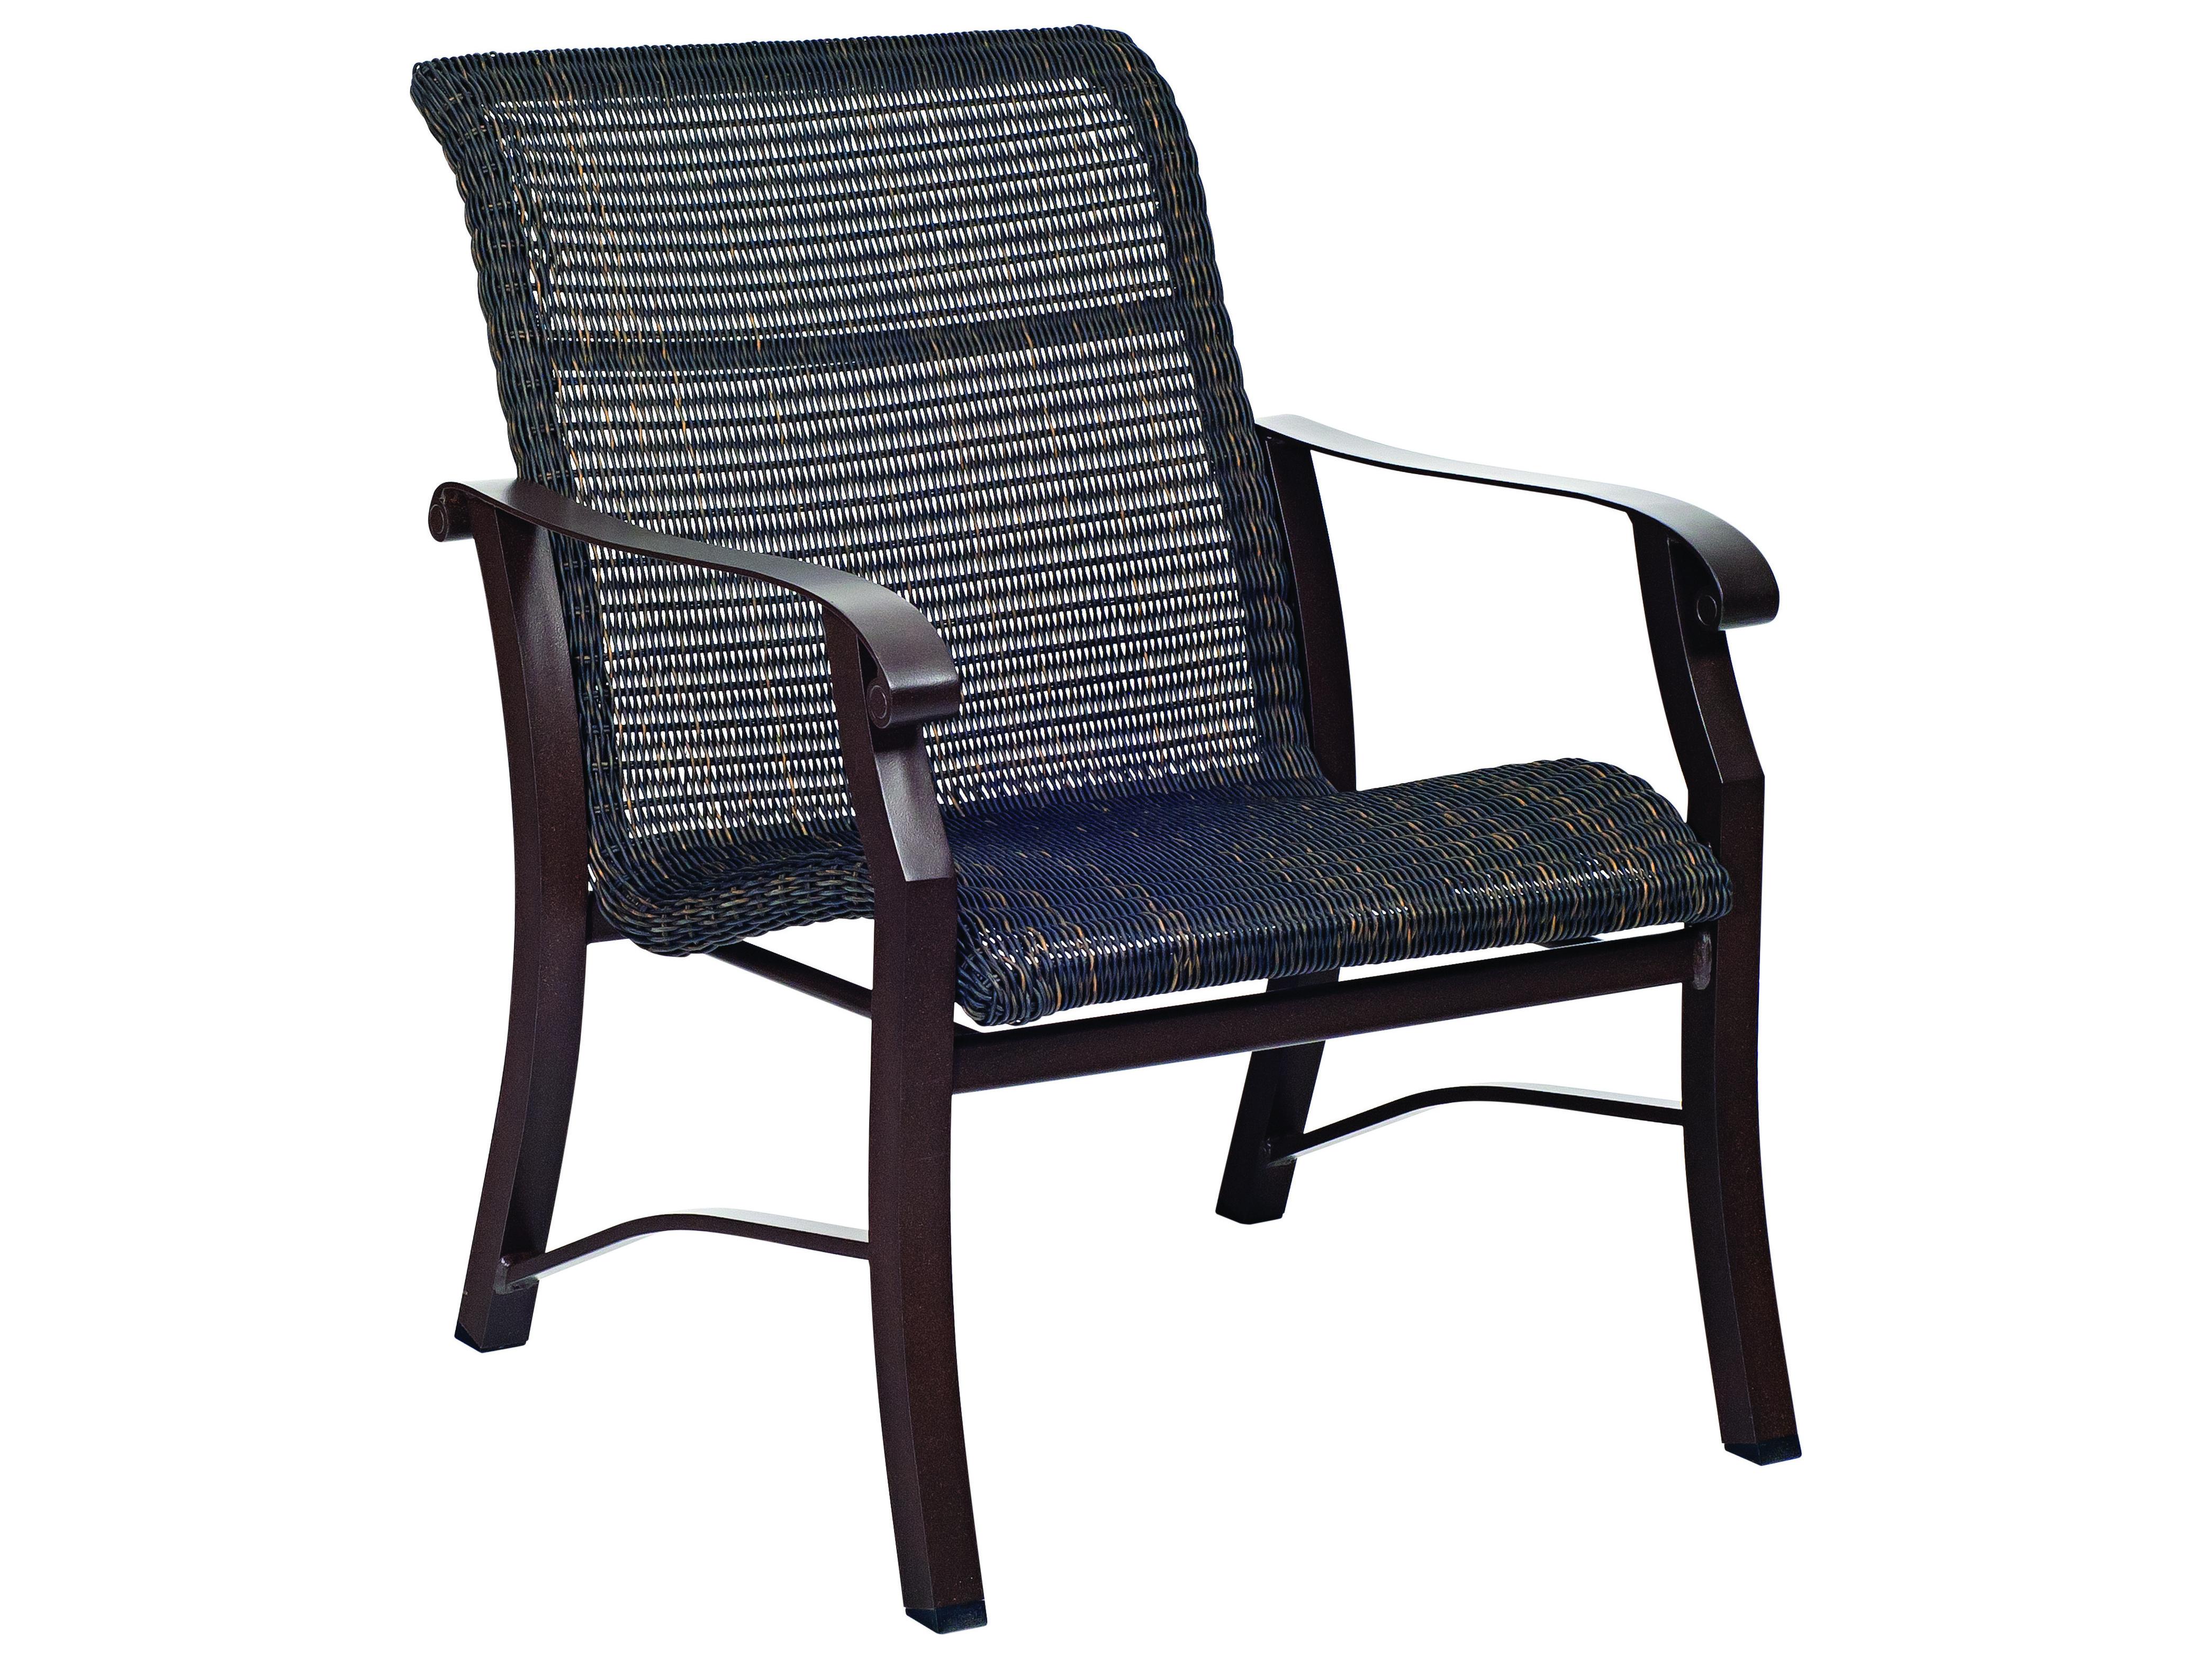 woodard cortland woven round weave wicker lounge set. Black Bedroom Furniture Sets. Home Design Ideas